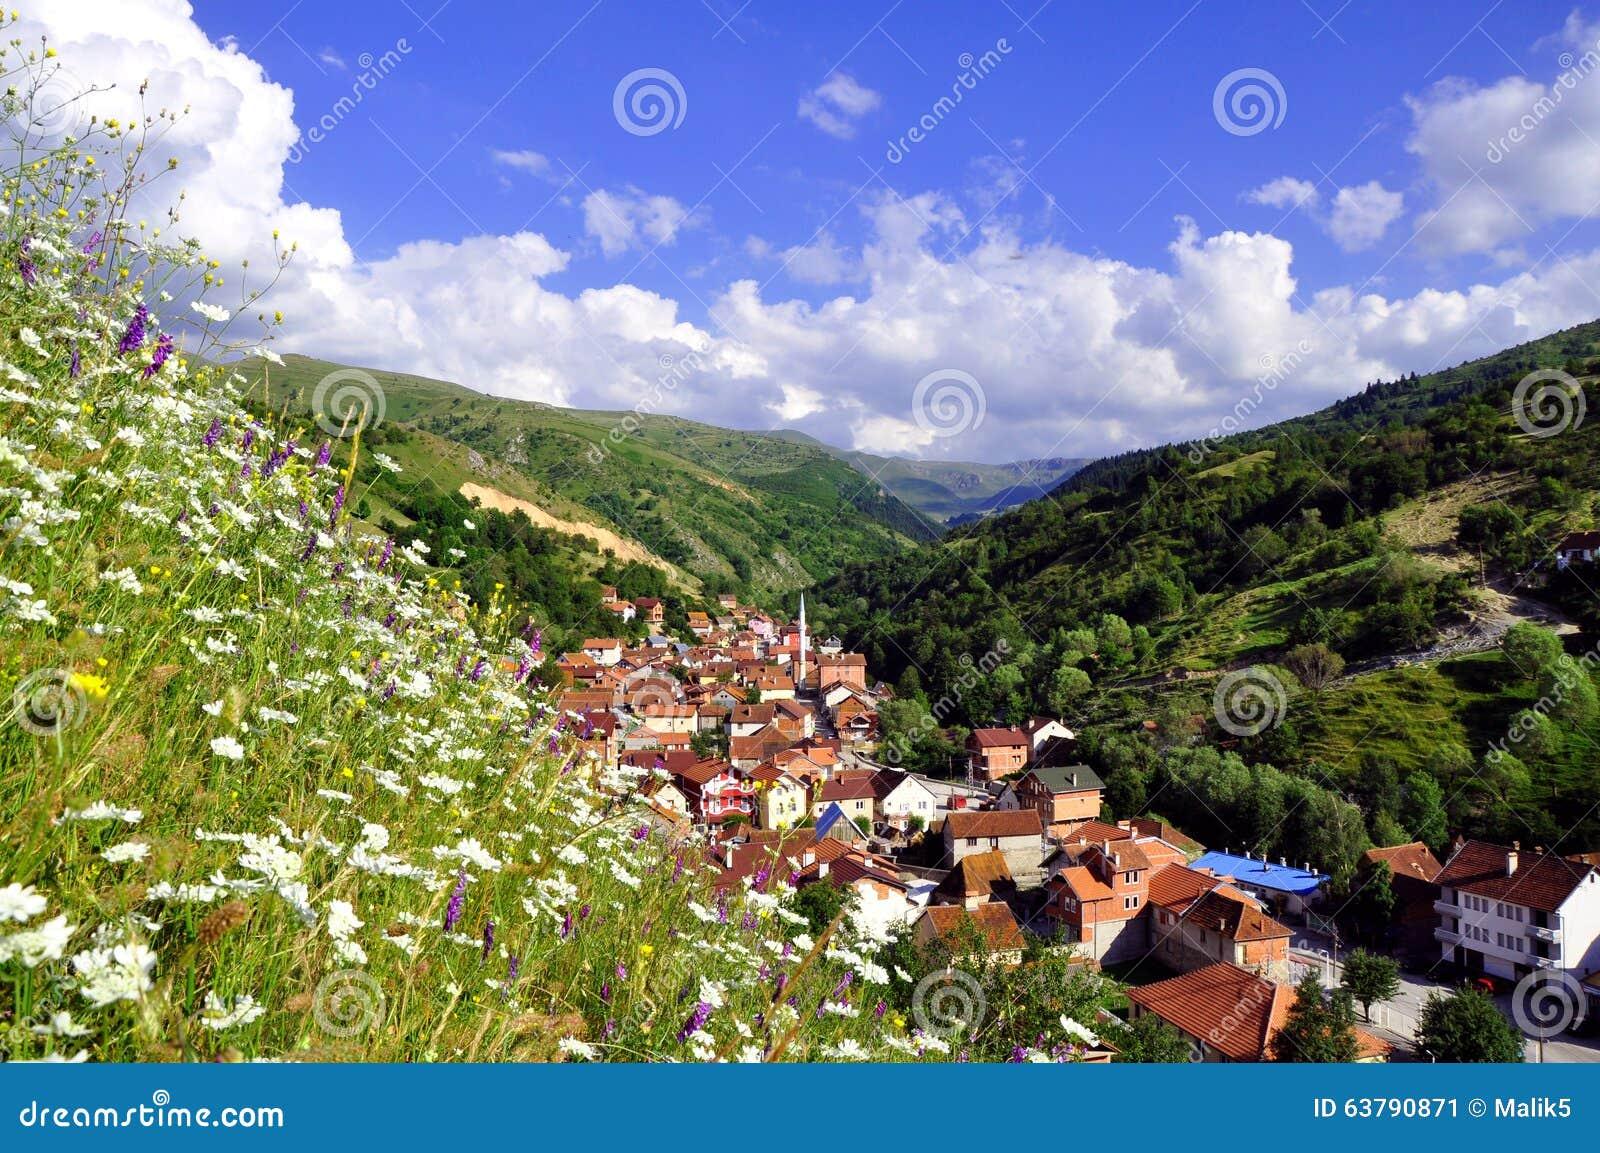 Summer rural landscape with the village